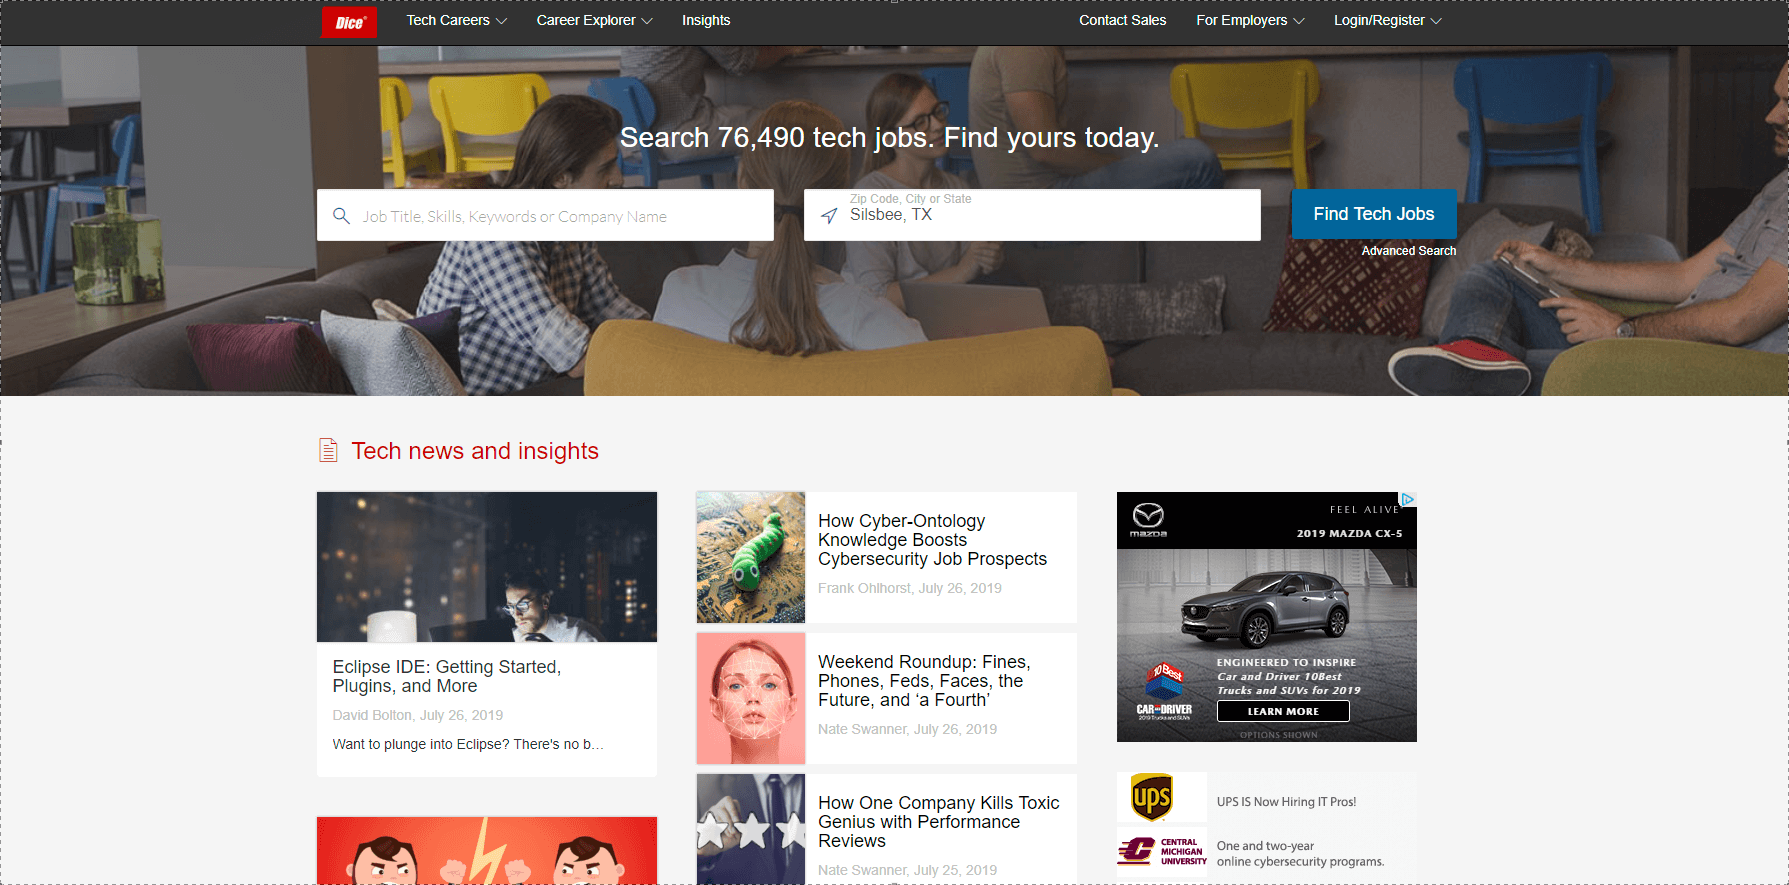 Dice.com